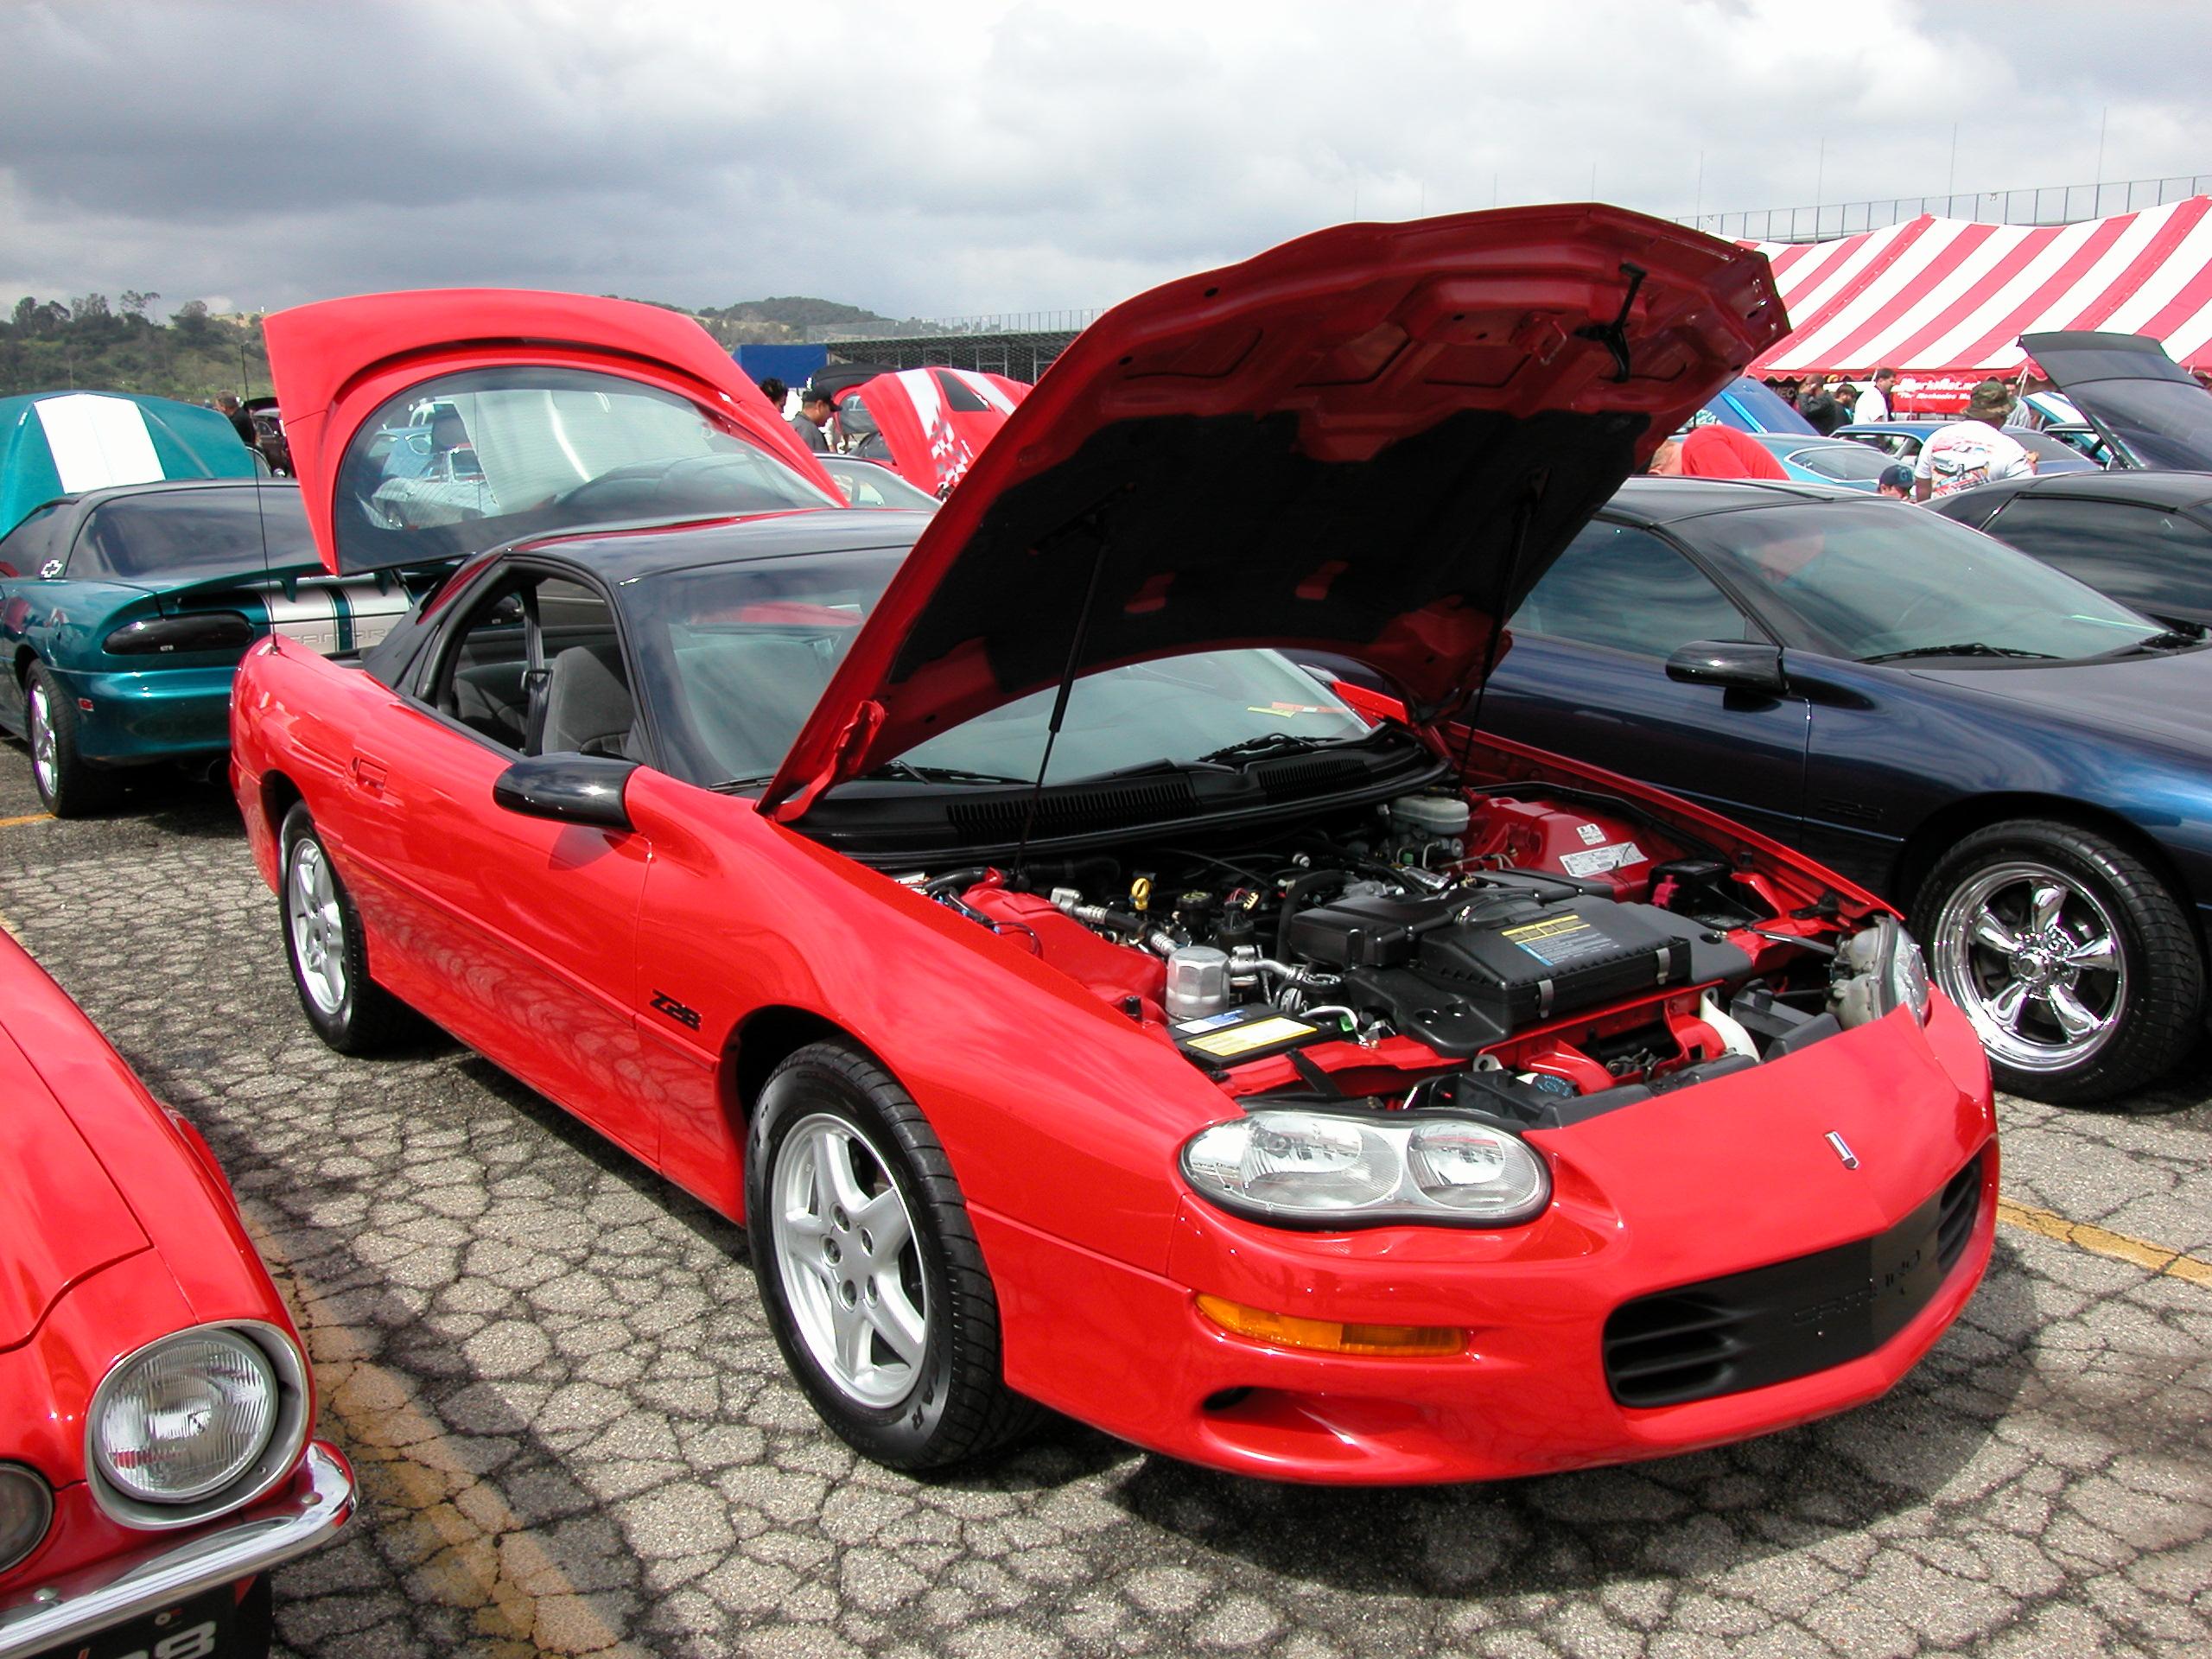 1998 Chevrolet Camaro Vin Number Search Autodetective